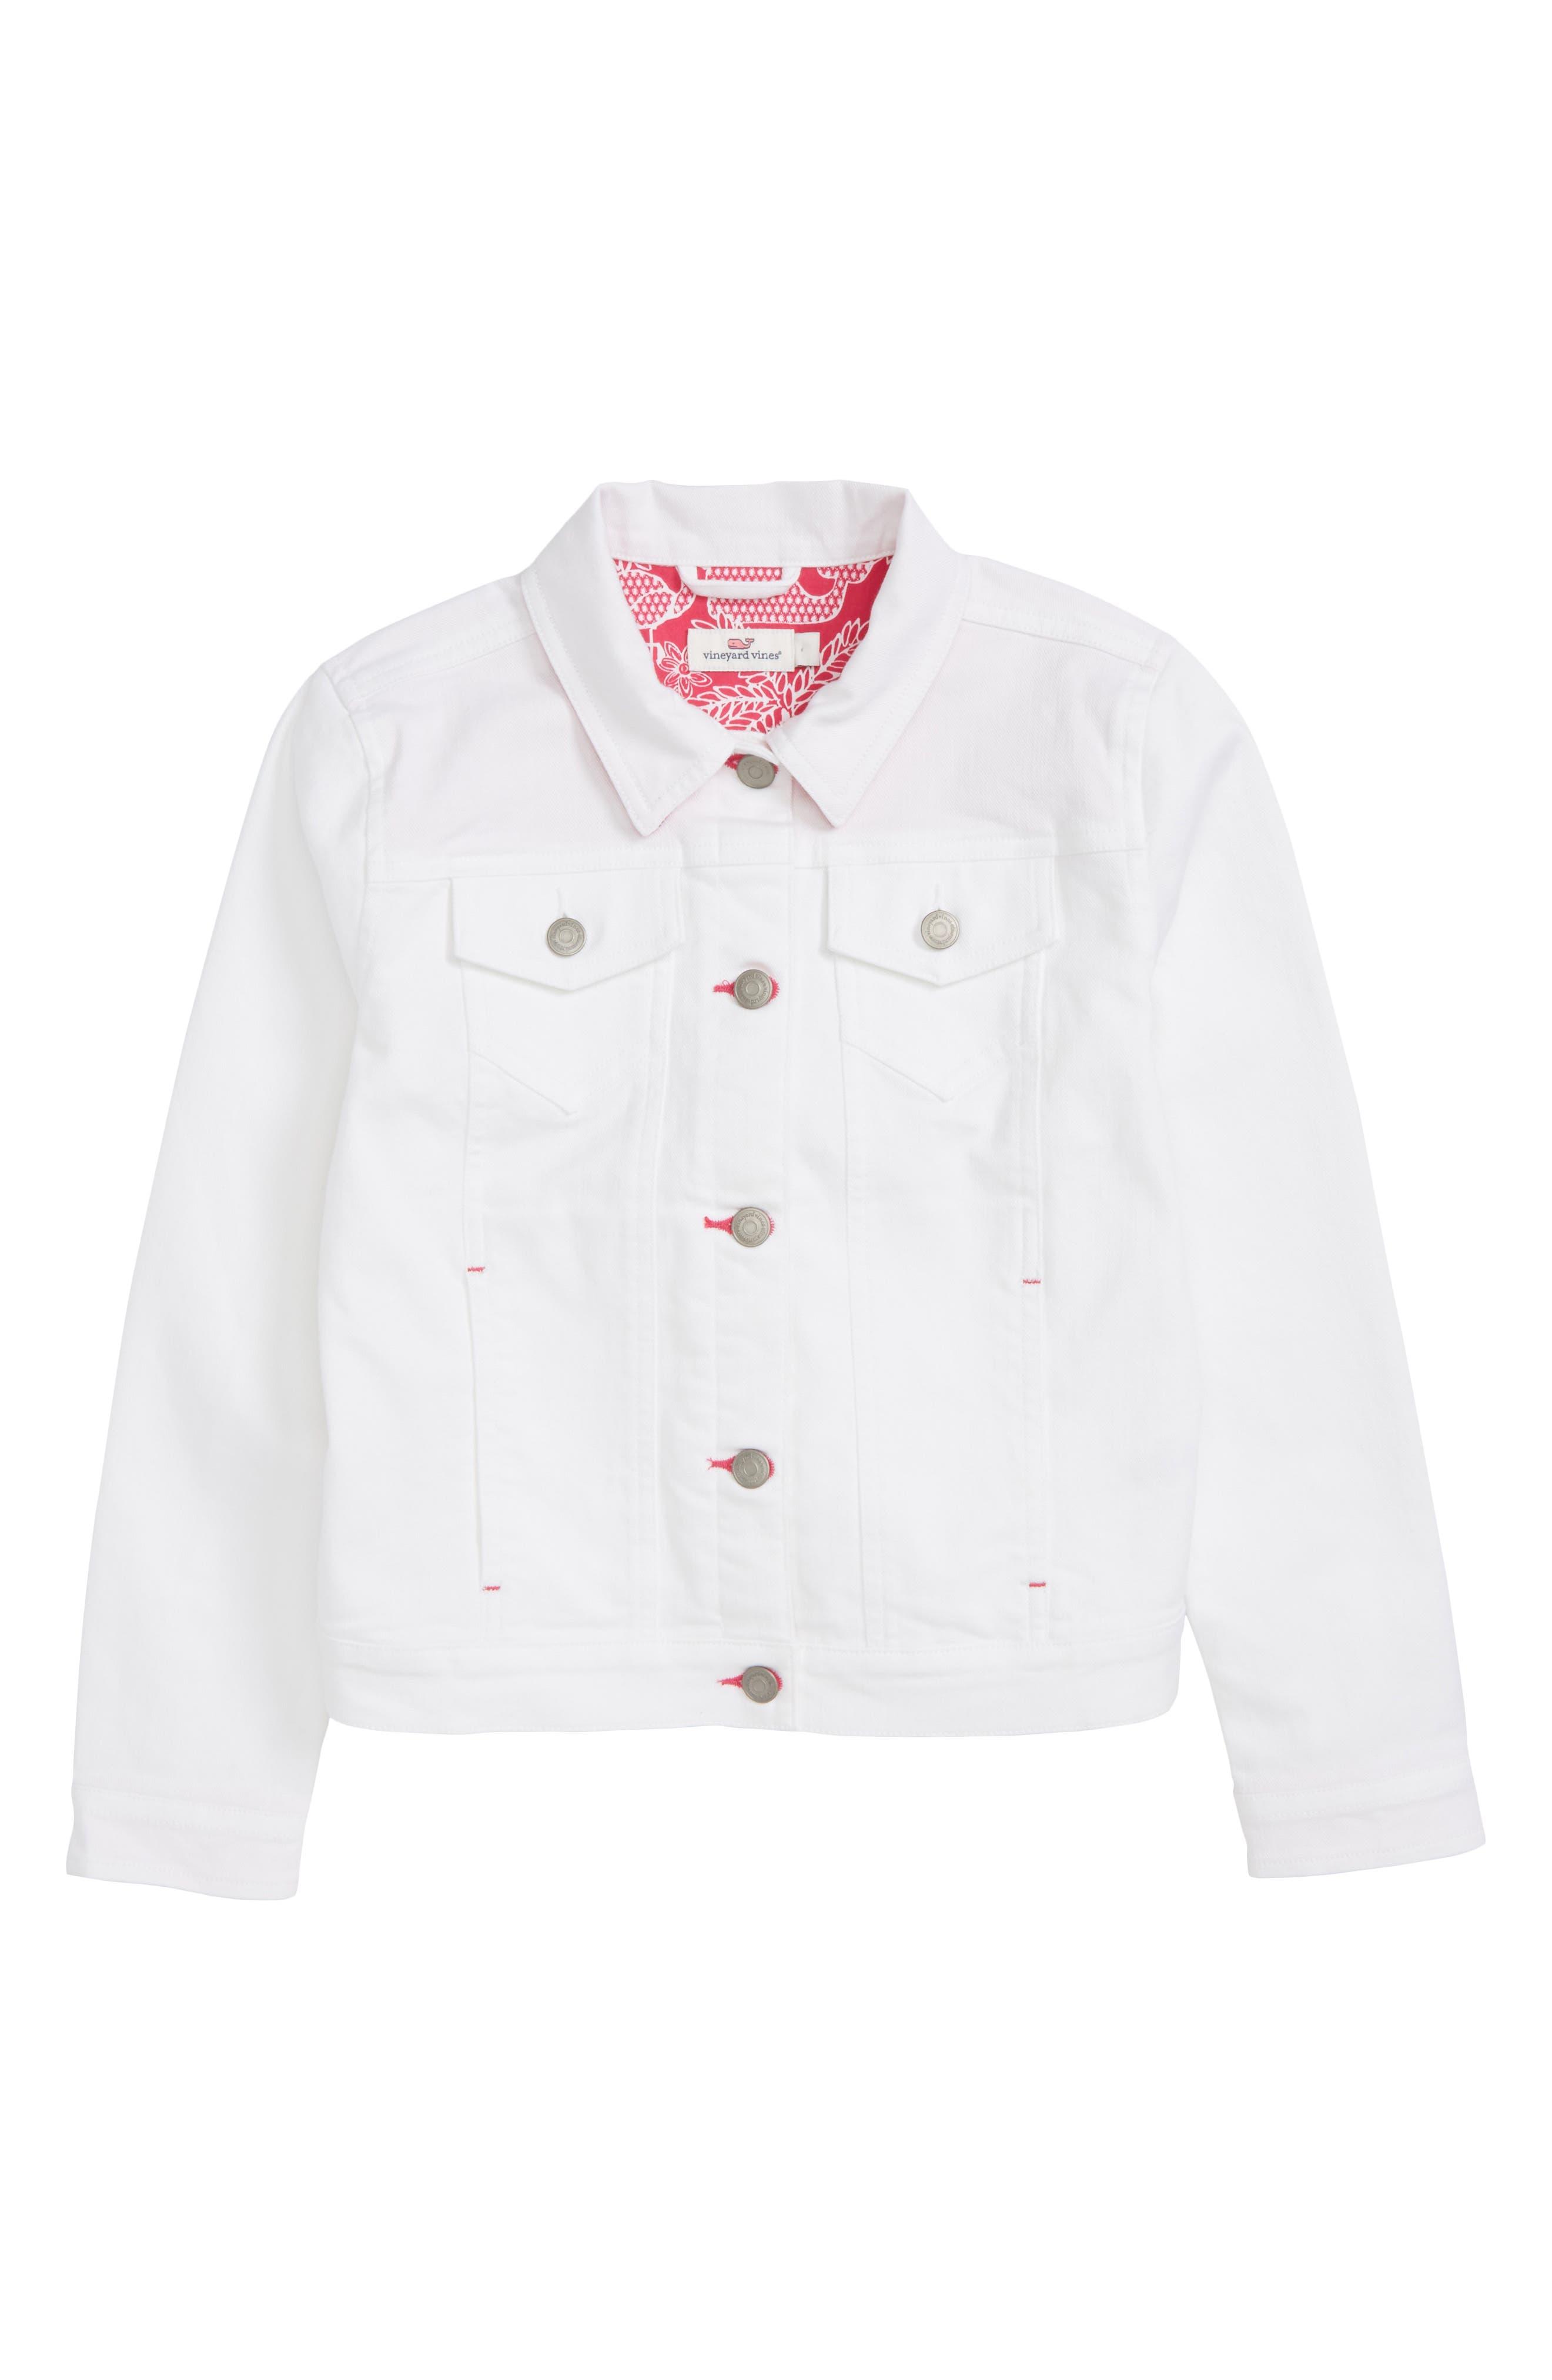 vineyard vines White Denim Jacket (Toddler Girls, Little Girls & Big Girls)